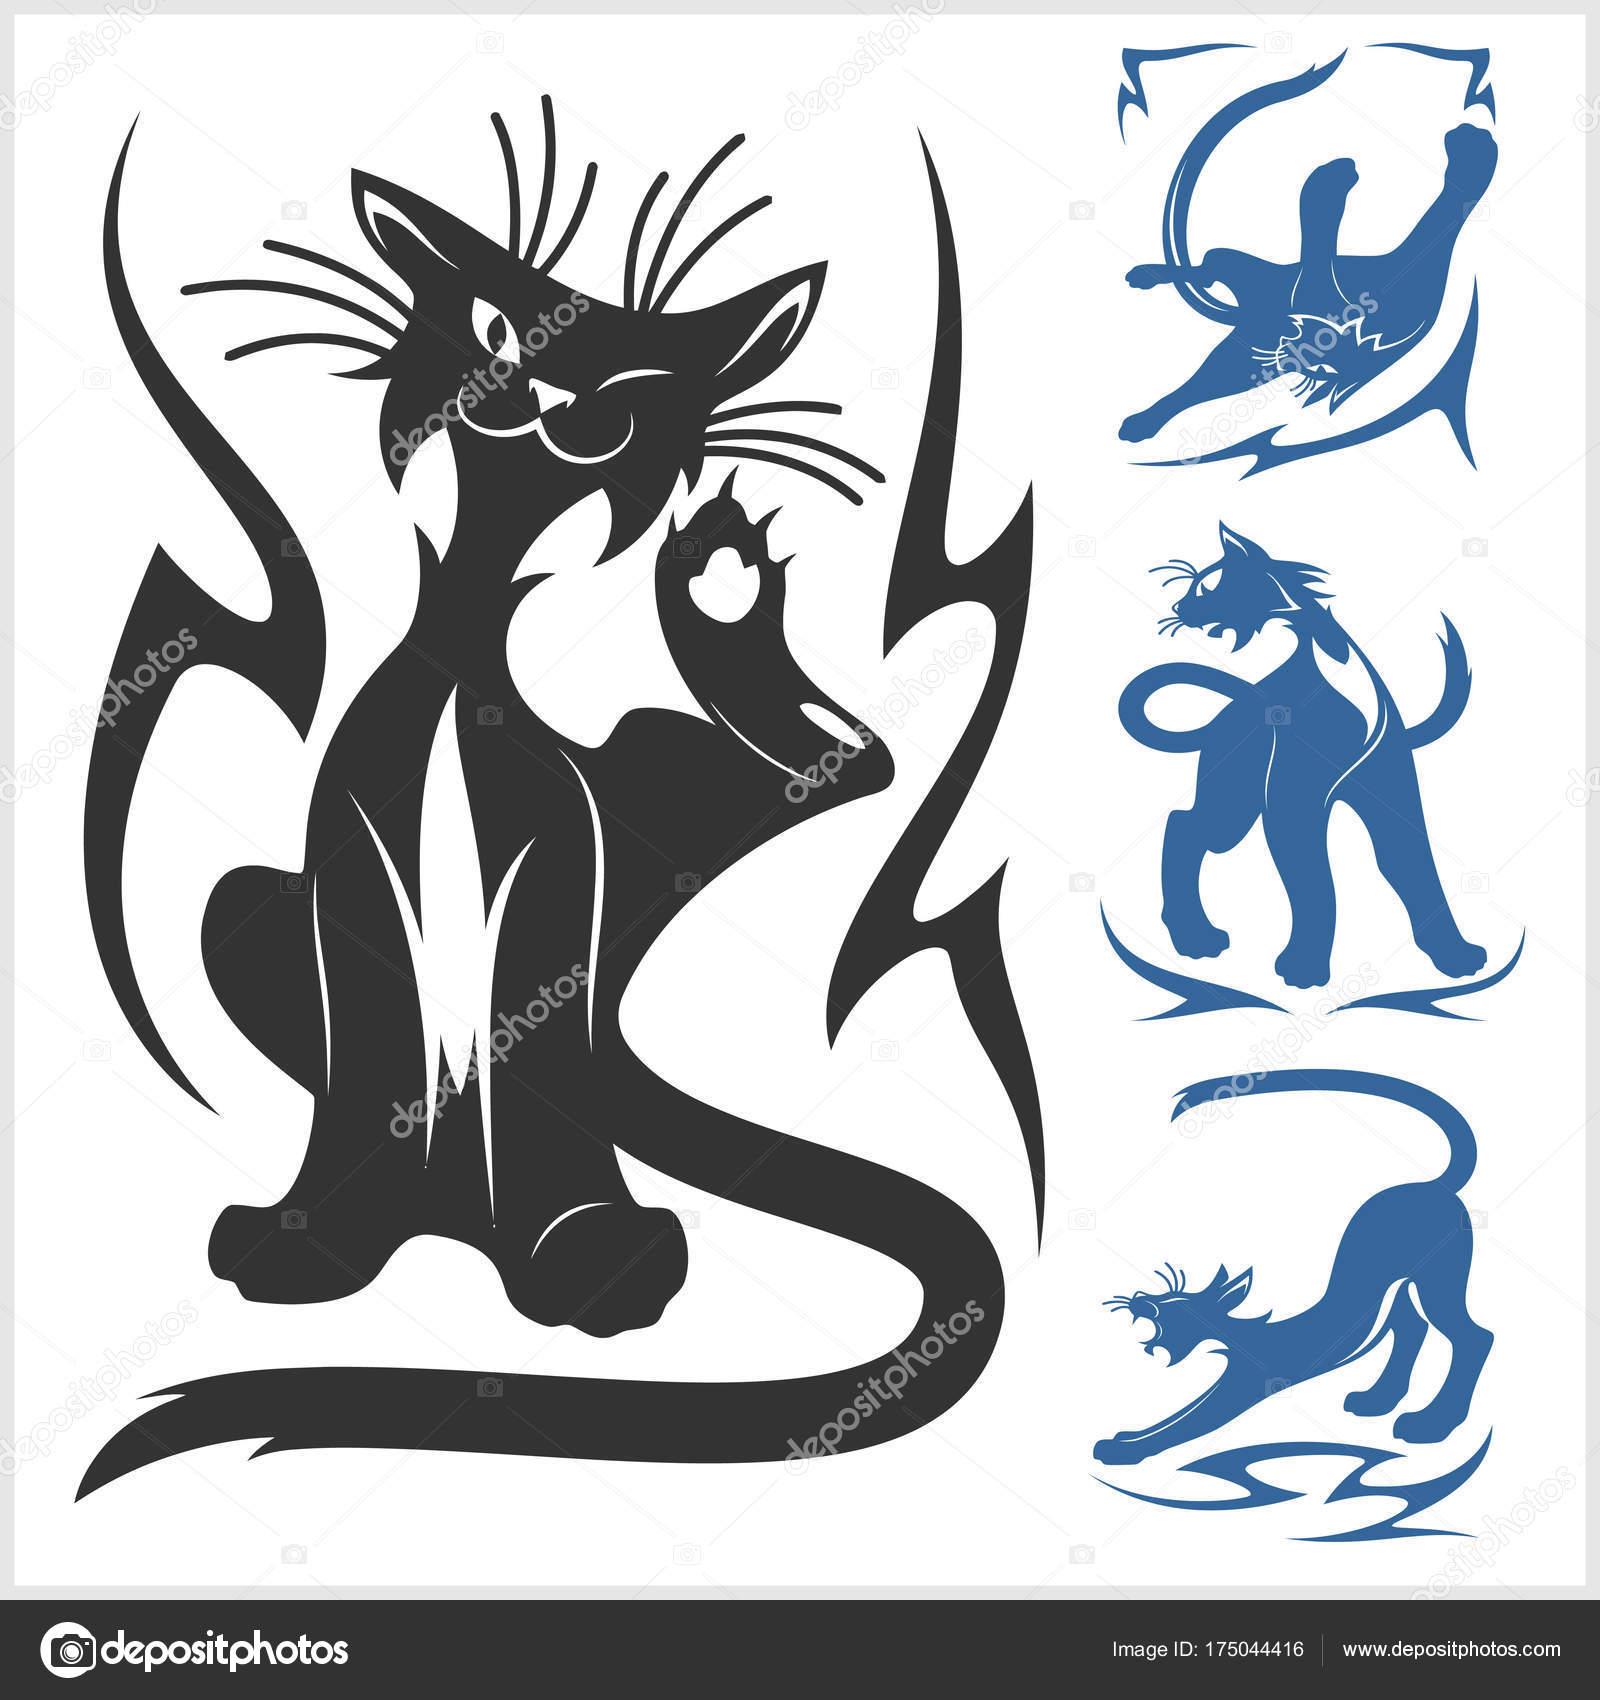 Dibujos Tatuaje Gato Tribal Felinos Tribales Para Tatuaje